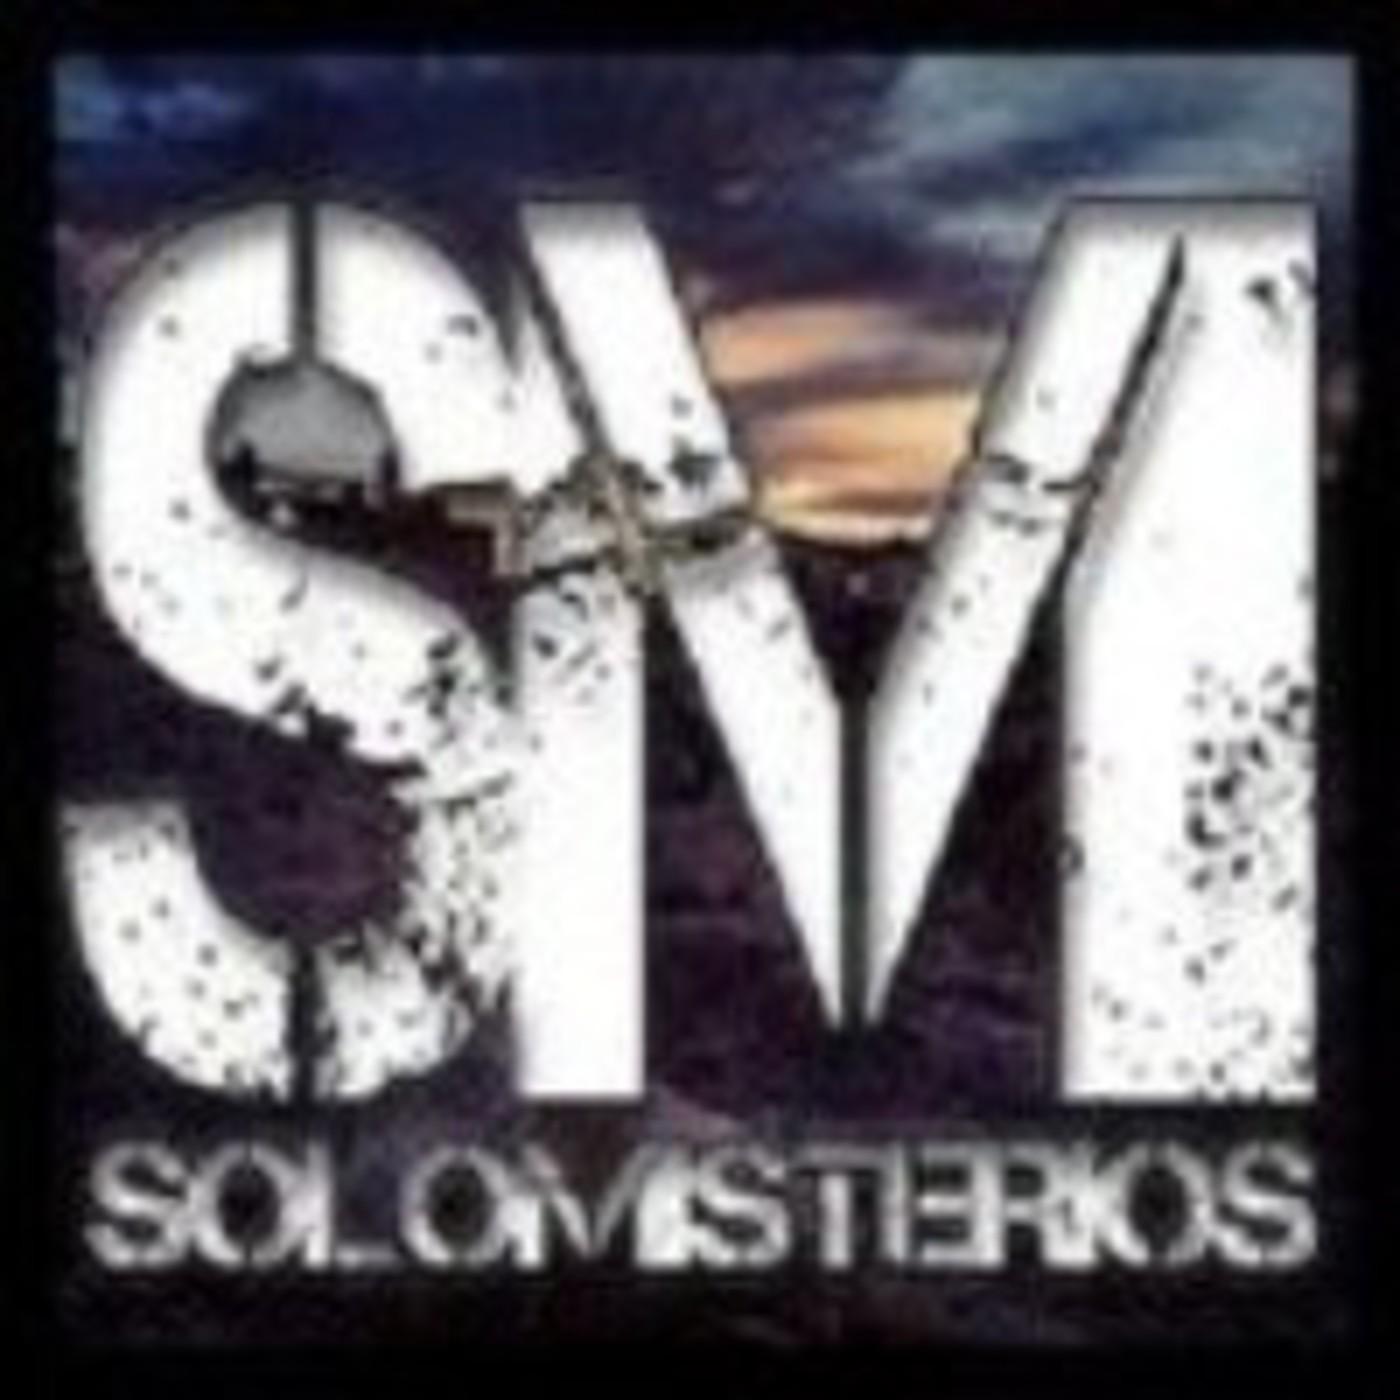 Solomisterios Nº8: